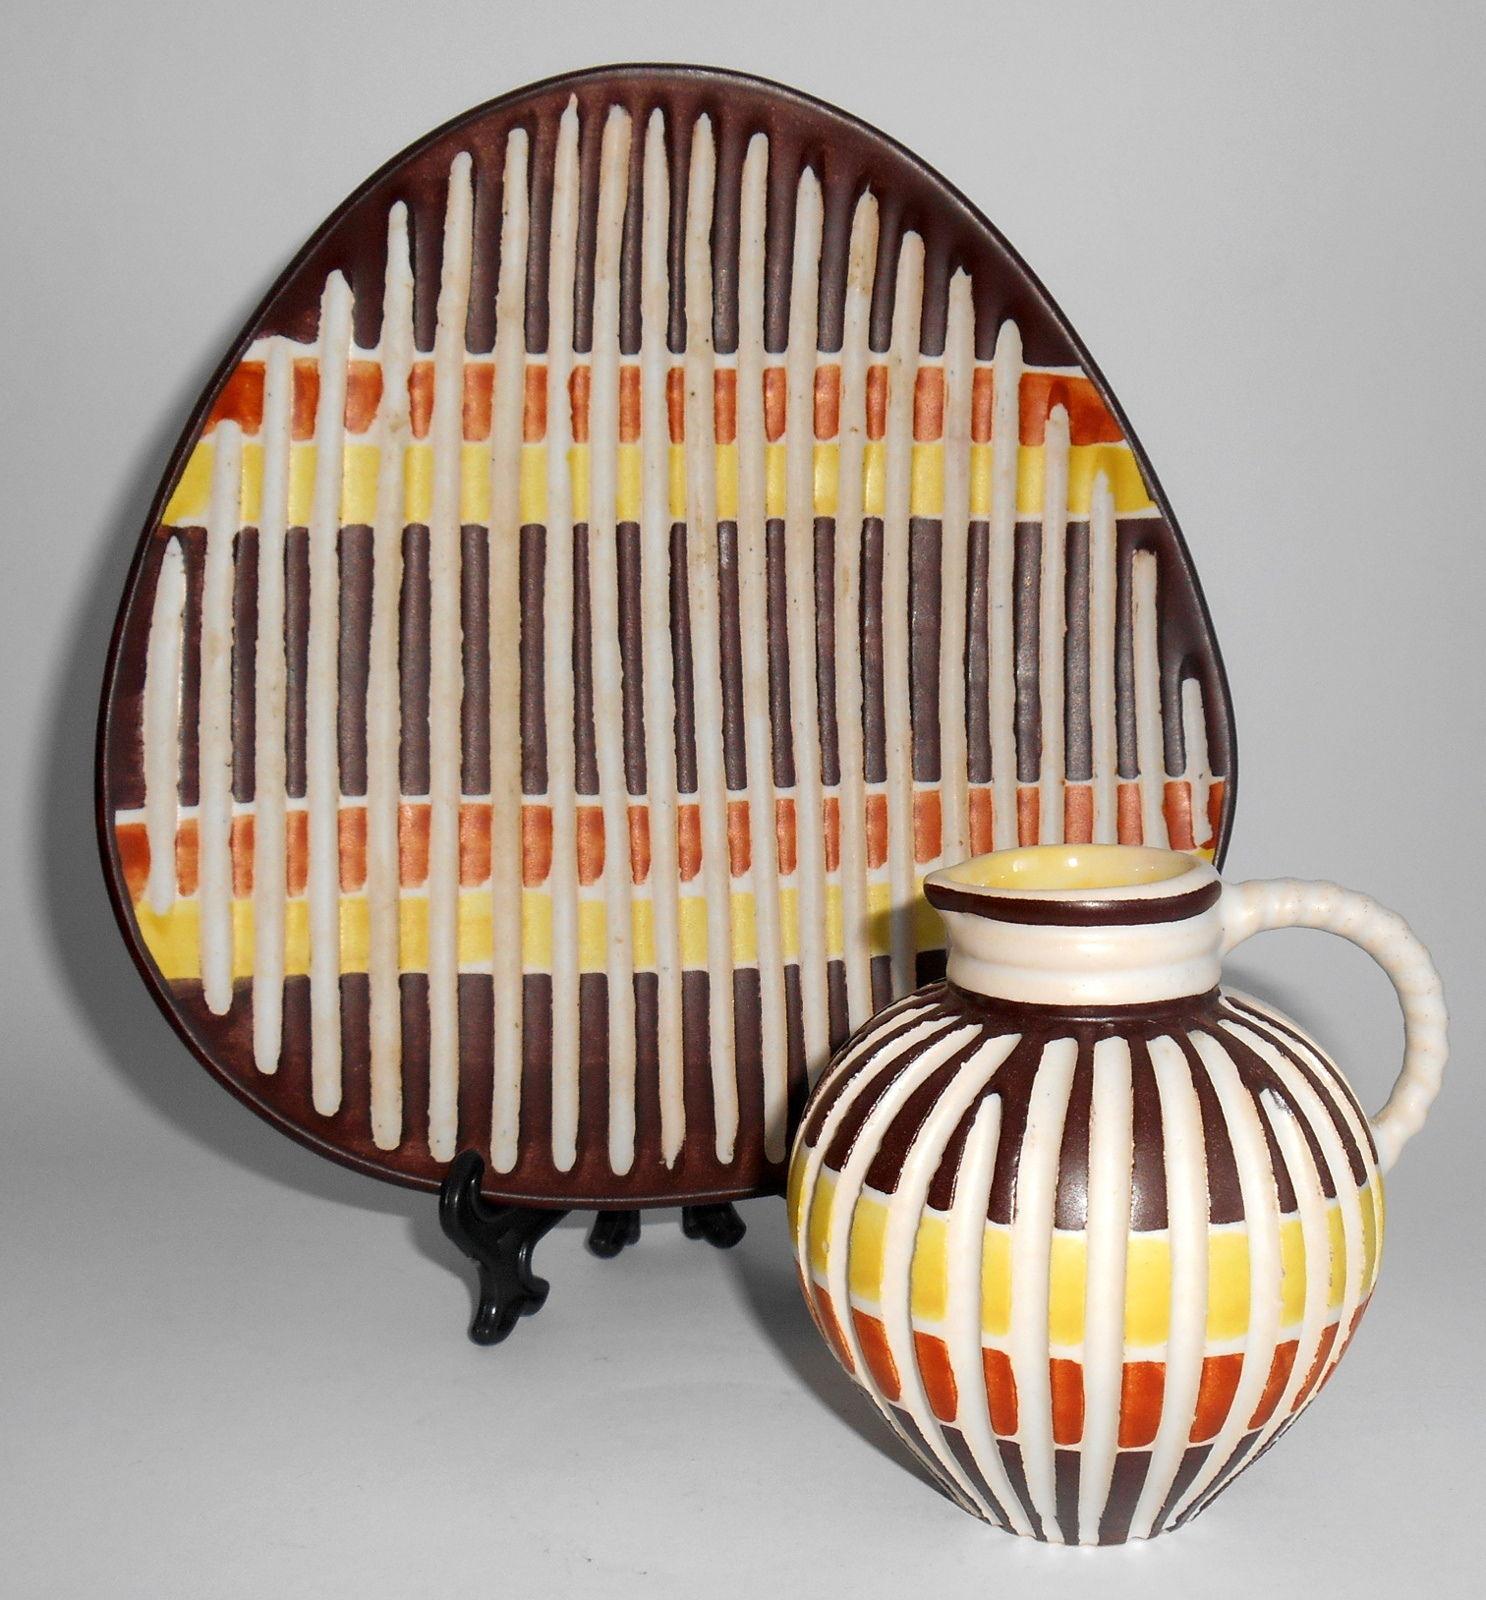 retro keramik muzeeum: RETRO WEST GERMAN POTTERY ILKRA EDEL KERAMIK VASE & PLATE  retro keramik